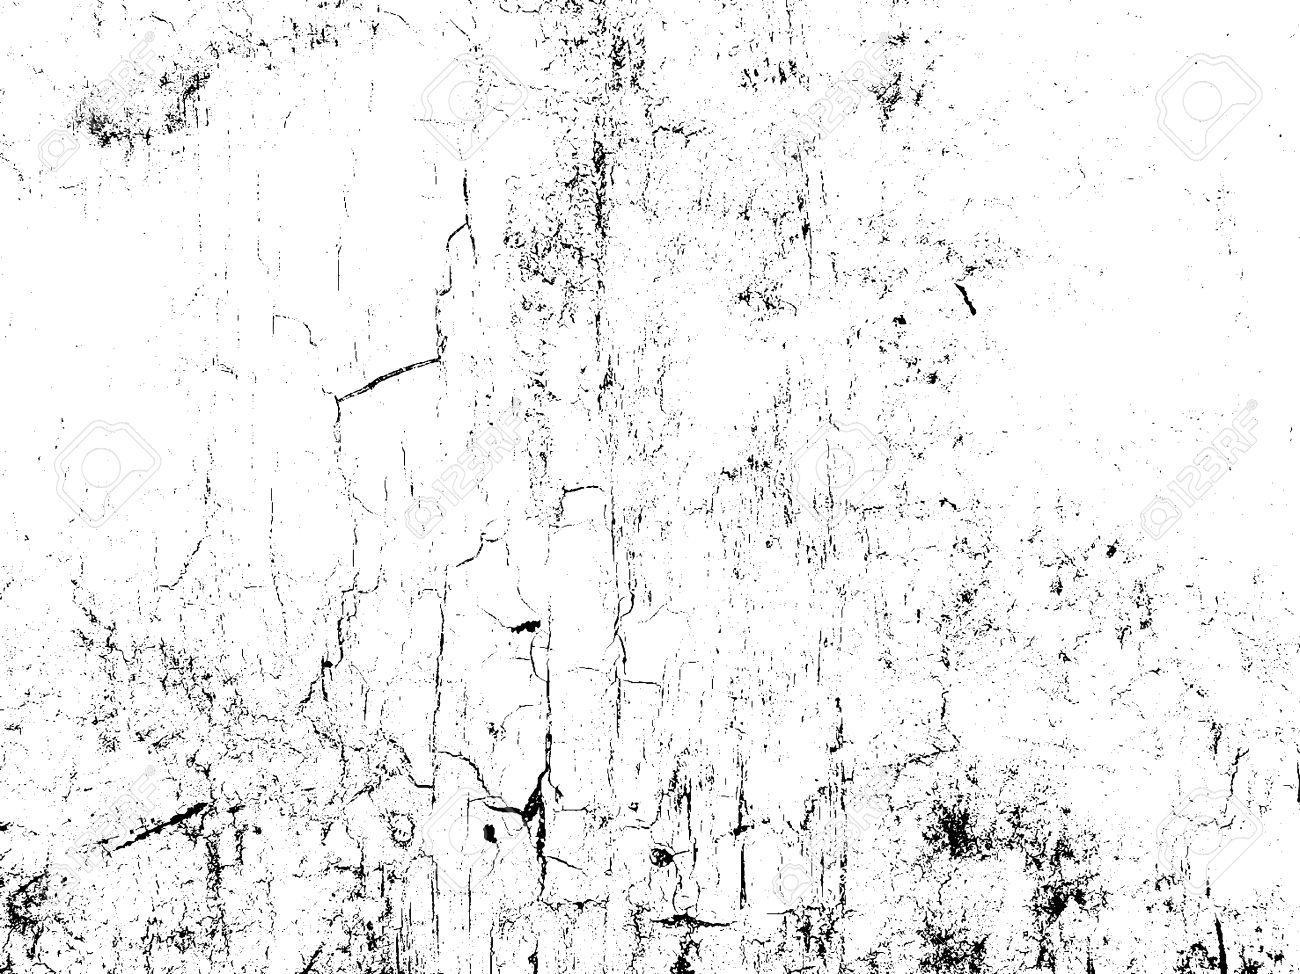 1300x974 Cracks Texture Overlay. Dry Cracked Ground Texture. Cracked